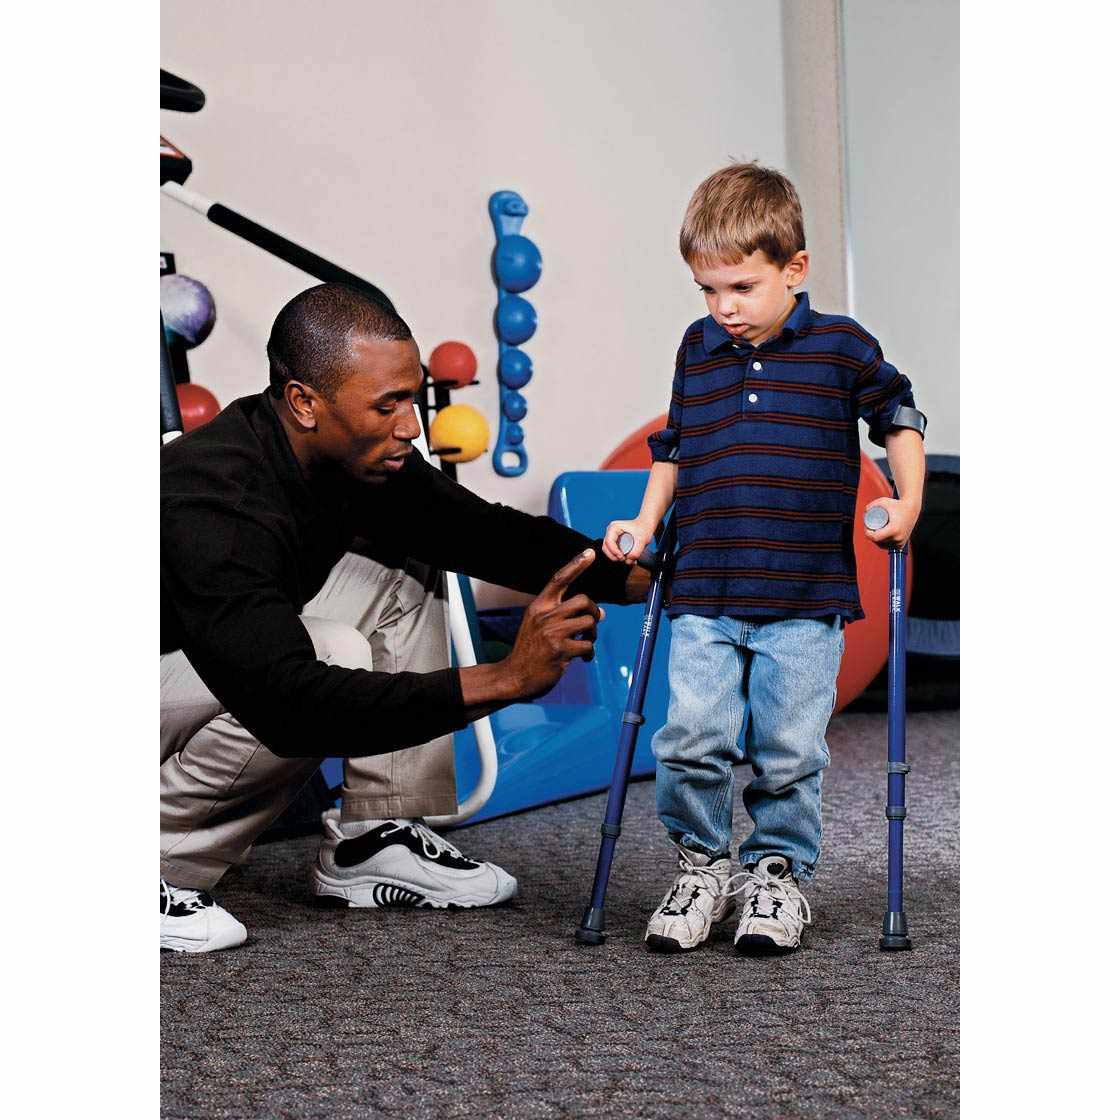 Walk Easy Pediatric Forearm Height Adjustable Crutches (Pair)